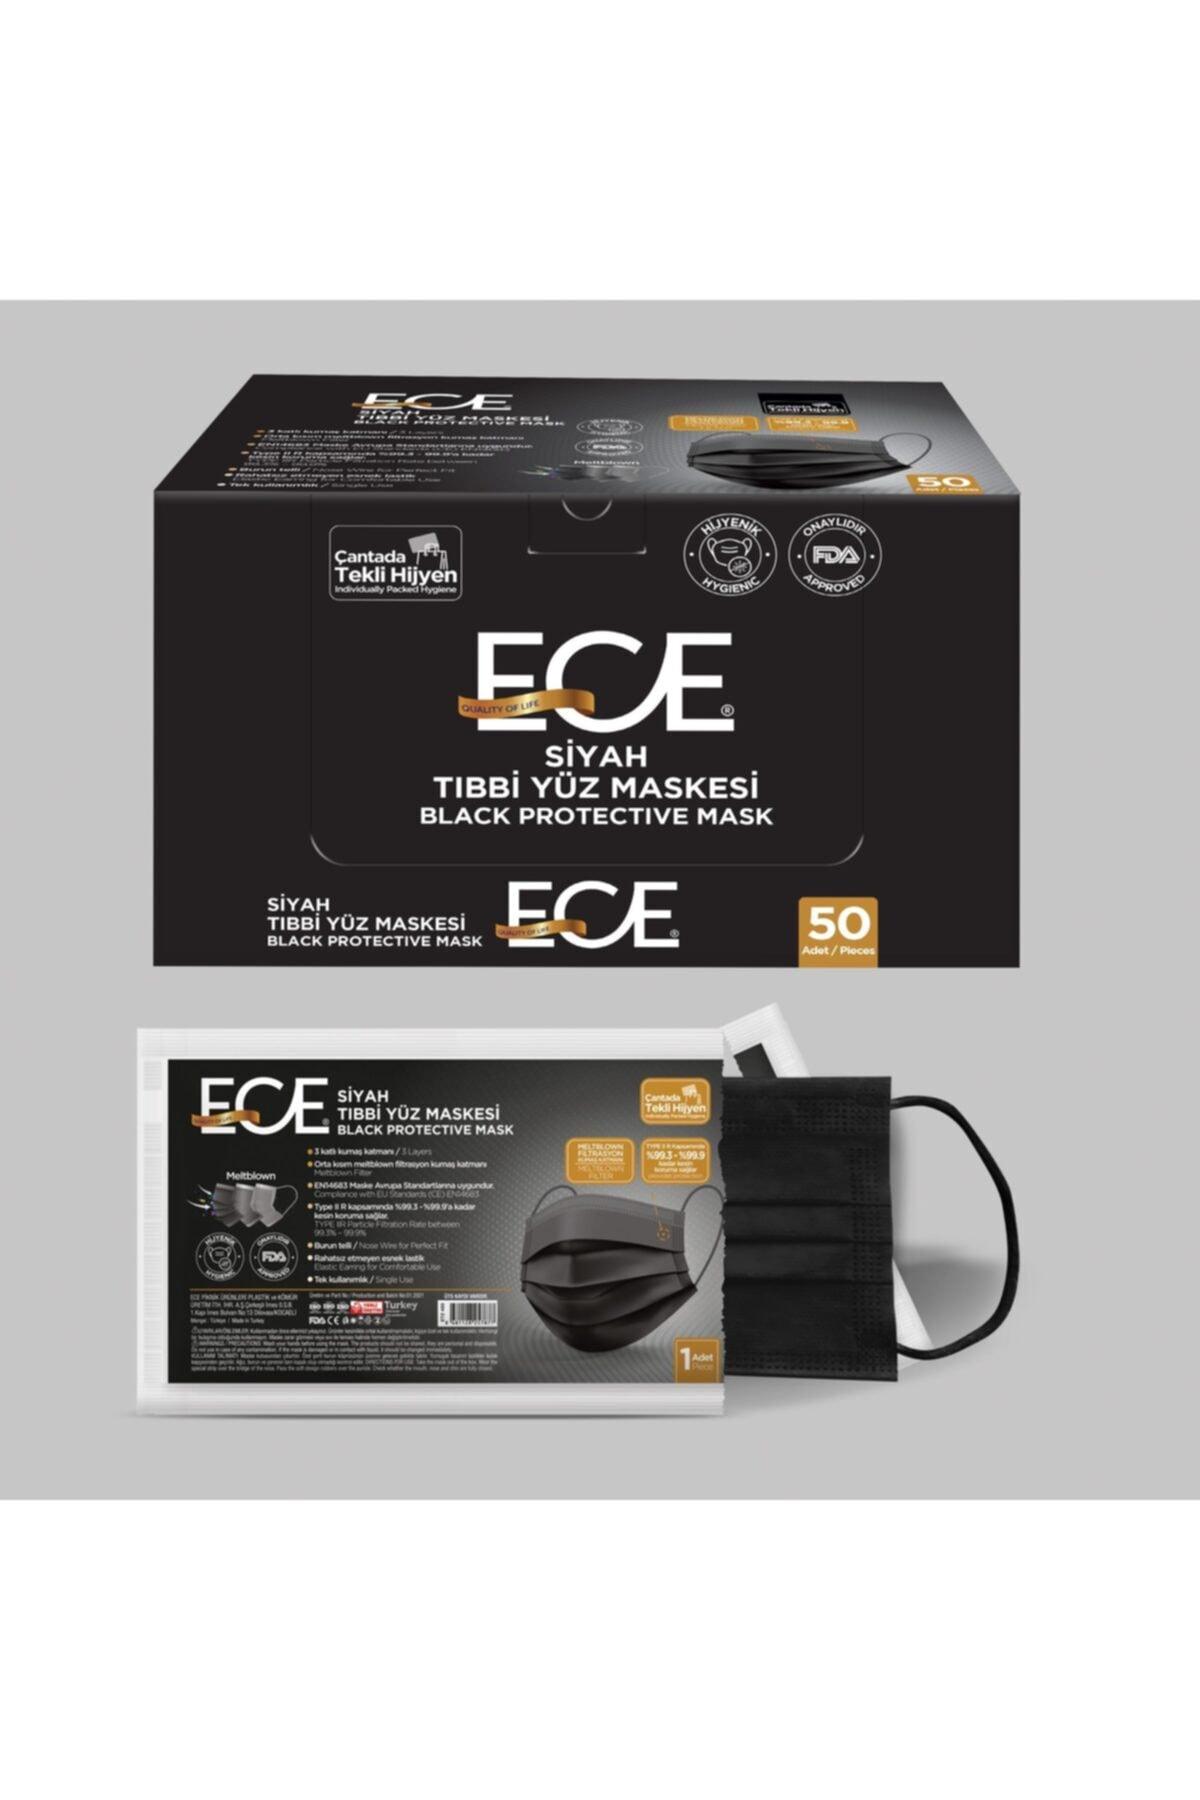 Ece Full Ultrasonik Tek Tek Paketli Meltblownlu Siyah Maske 50 Adet 1